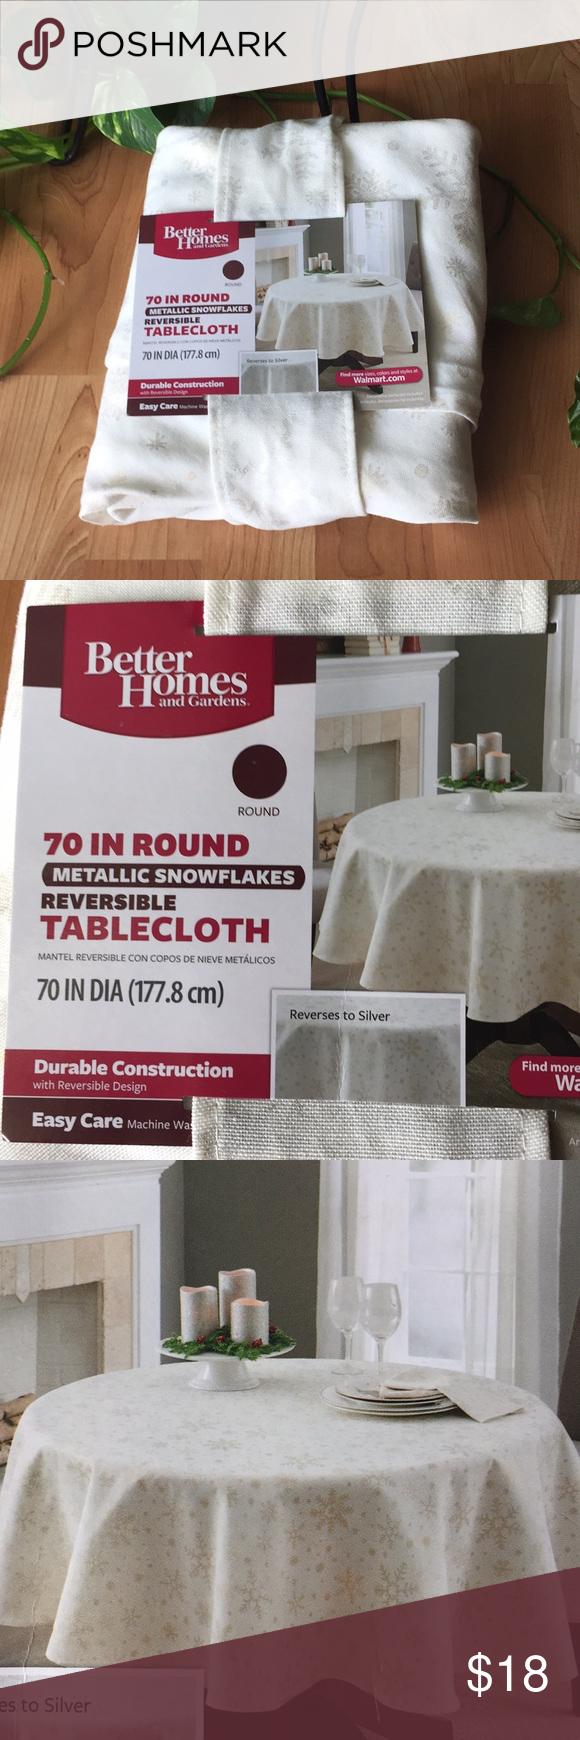 ed7c8d4e76c475158d03b4d27ed251a4 - Better Homes And Gardens Holiday Edition Tablecloth